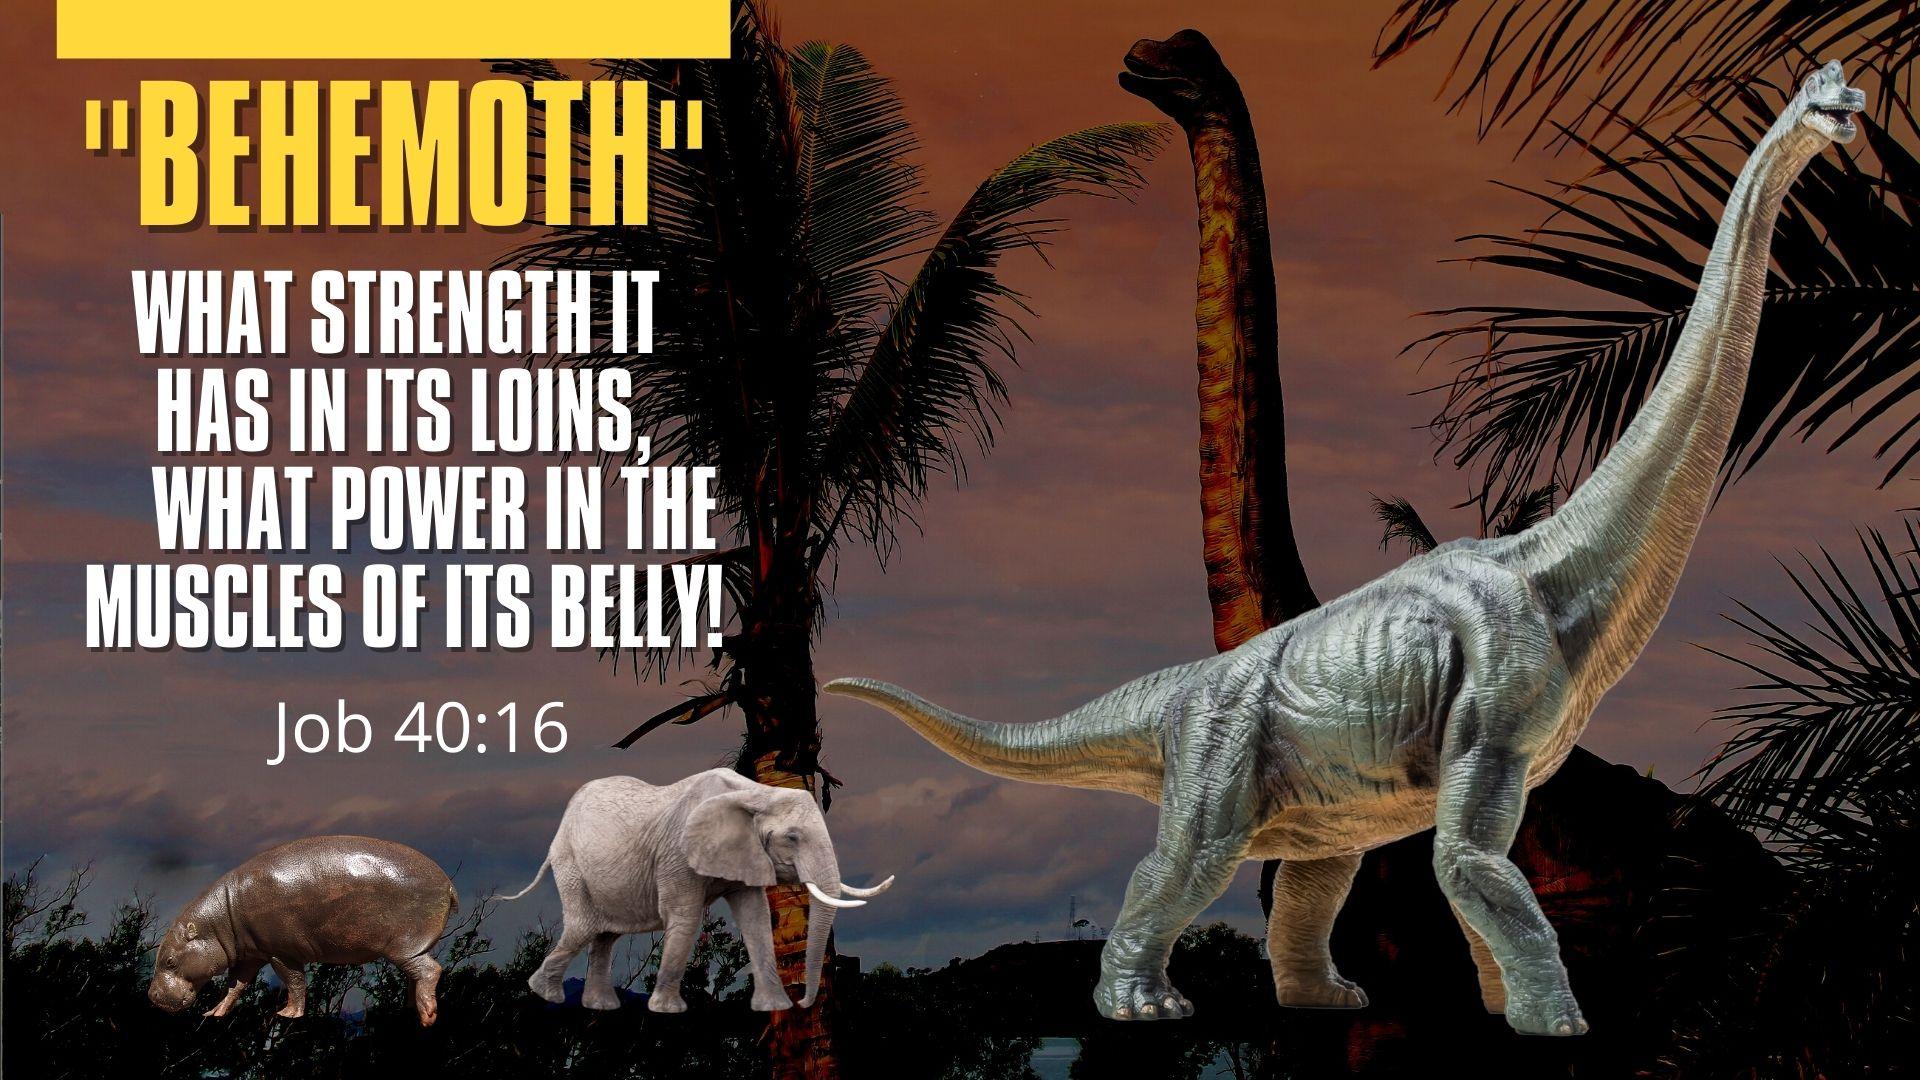 Behemoth.Job 40.16